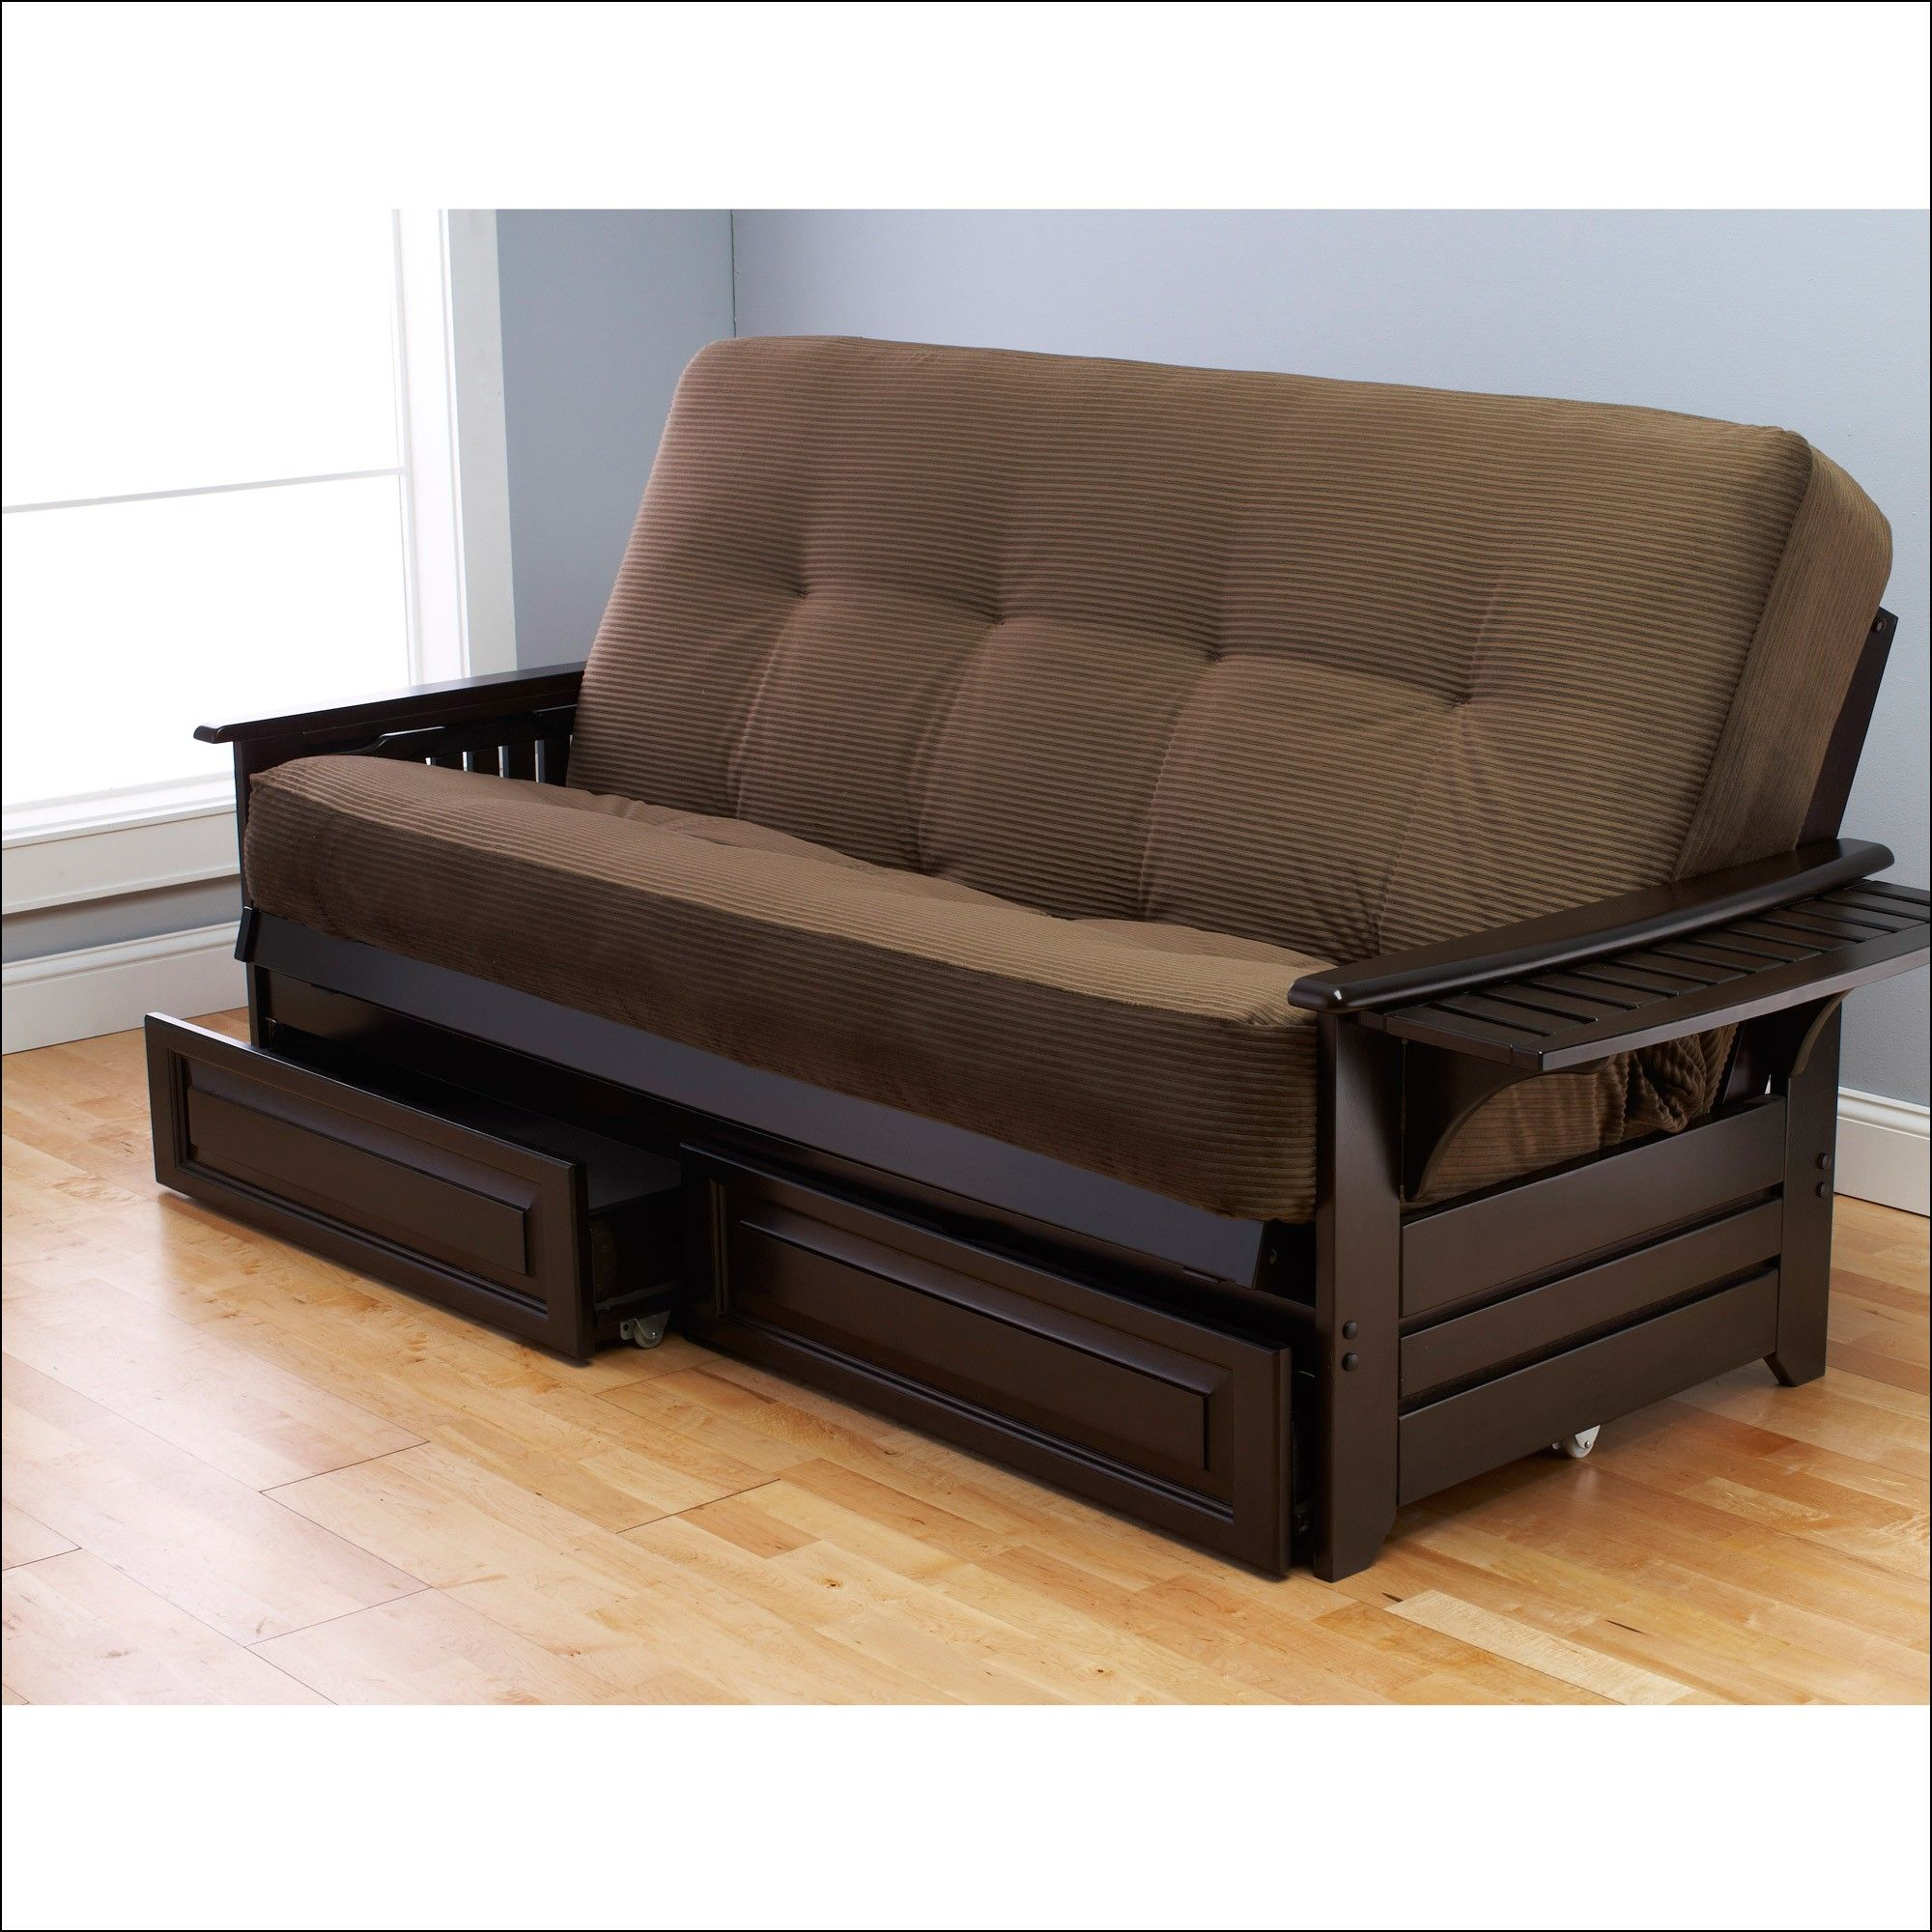 best futon mattress for couch best futon mattress for couch   couch  u0026 sofa gallery   pinterest      rh   pinterest co uk